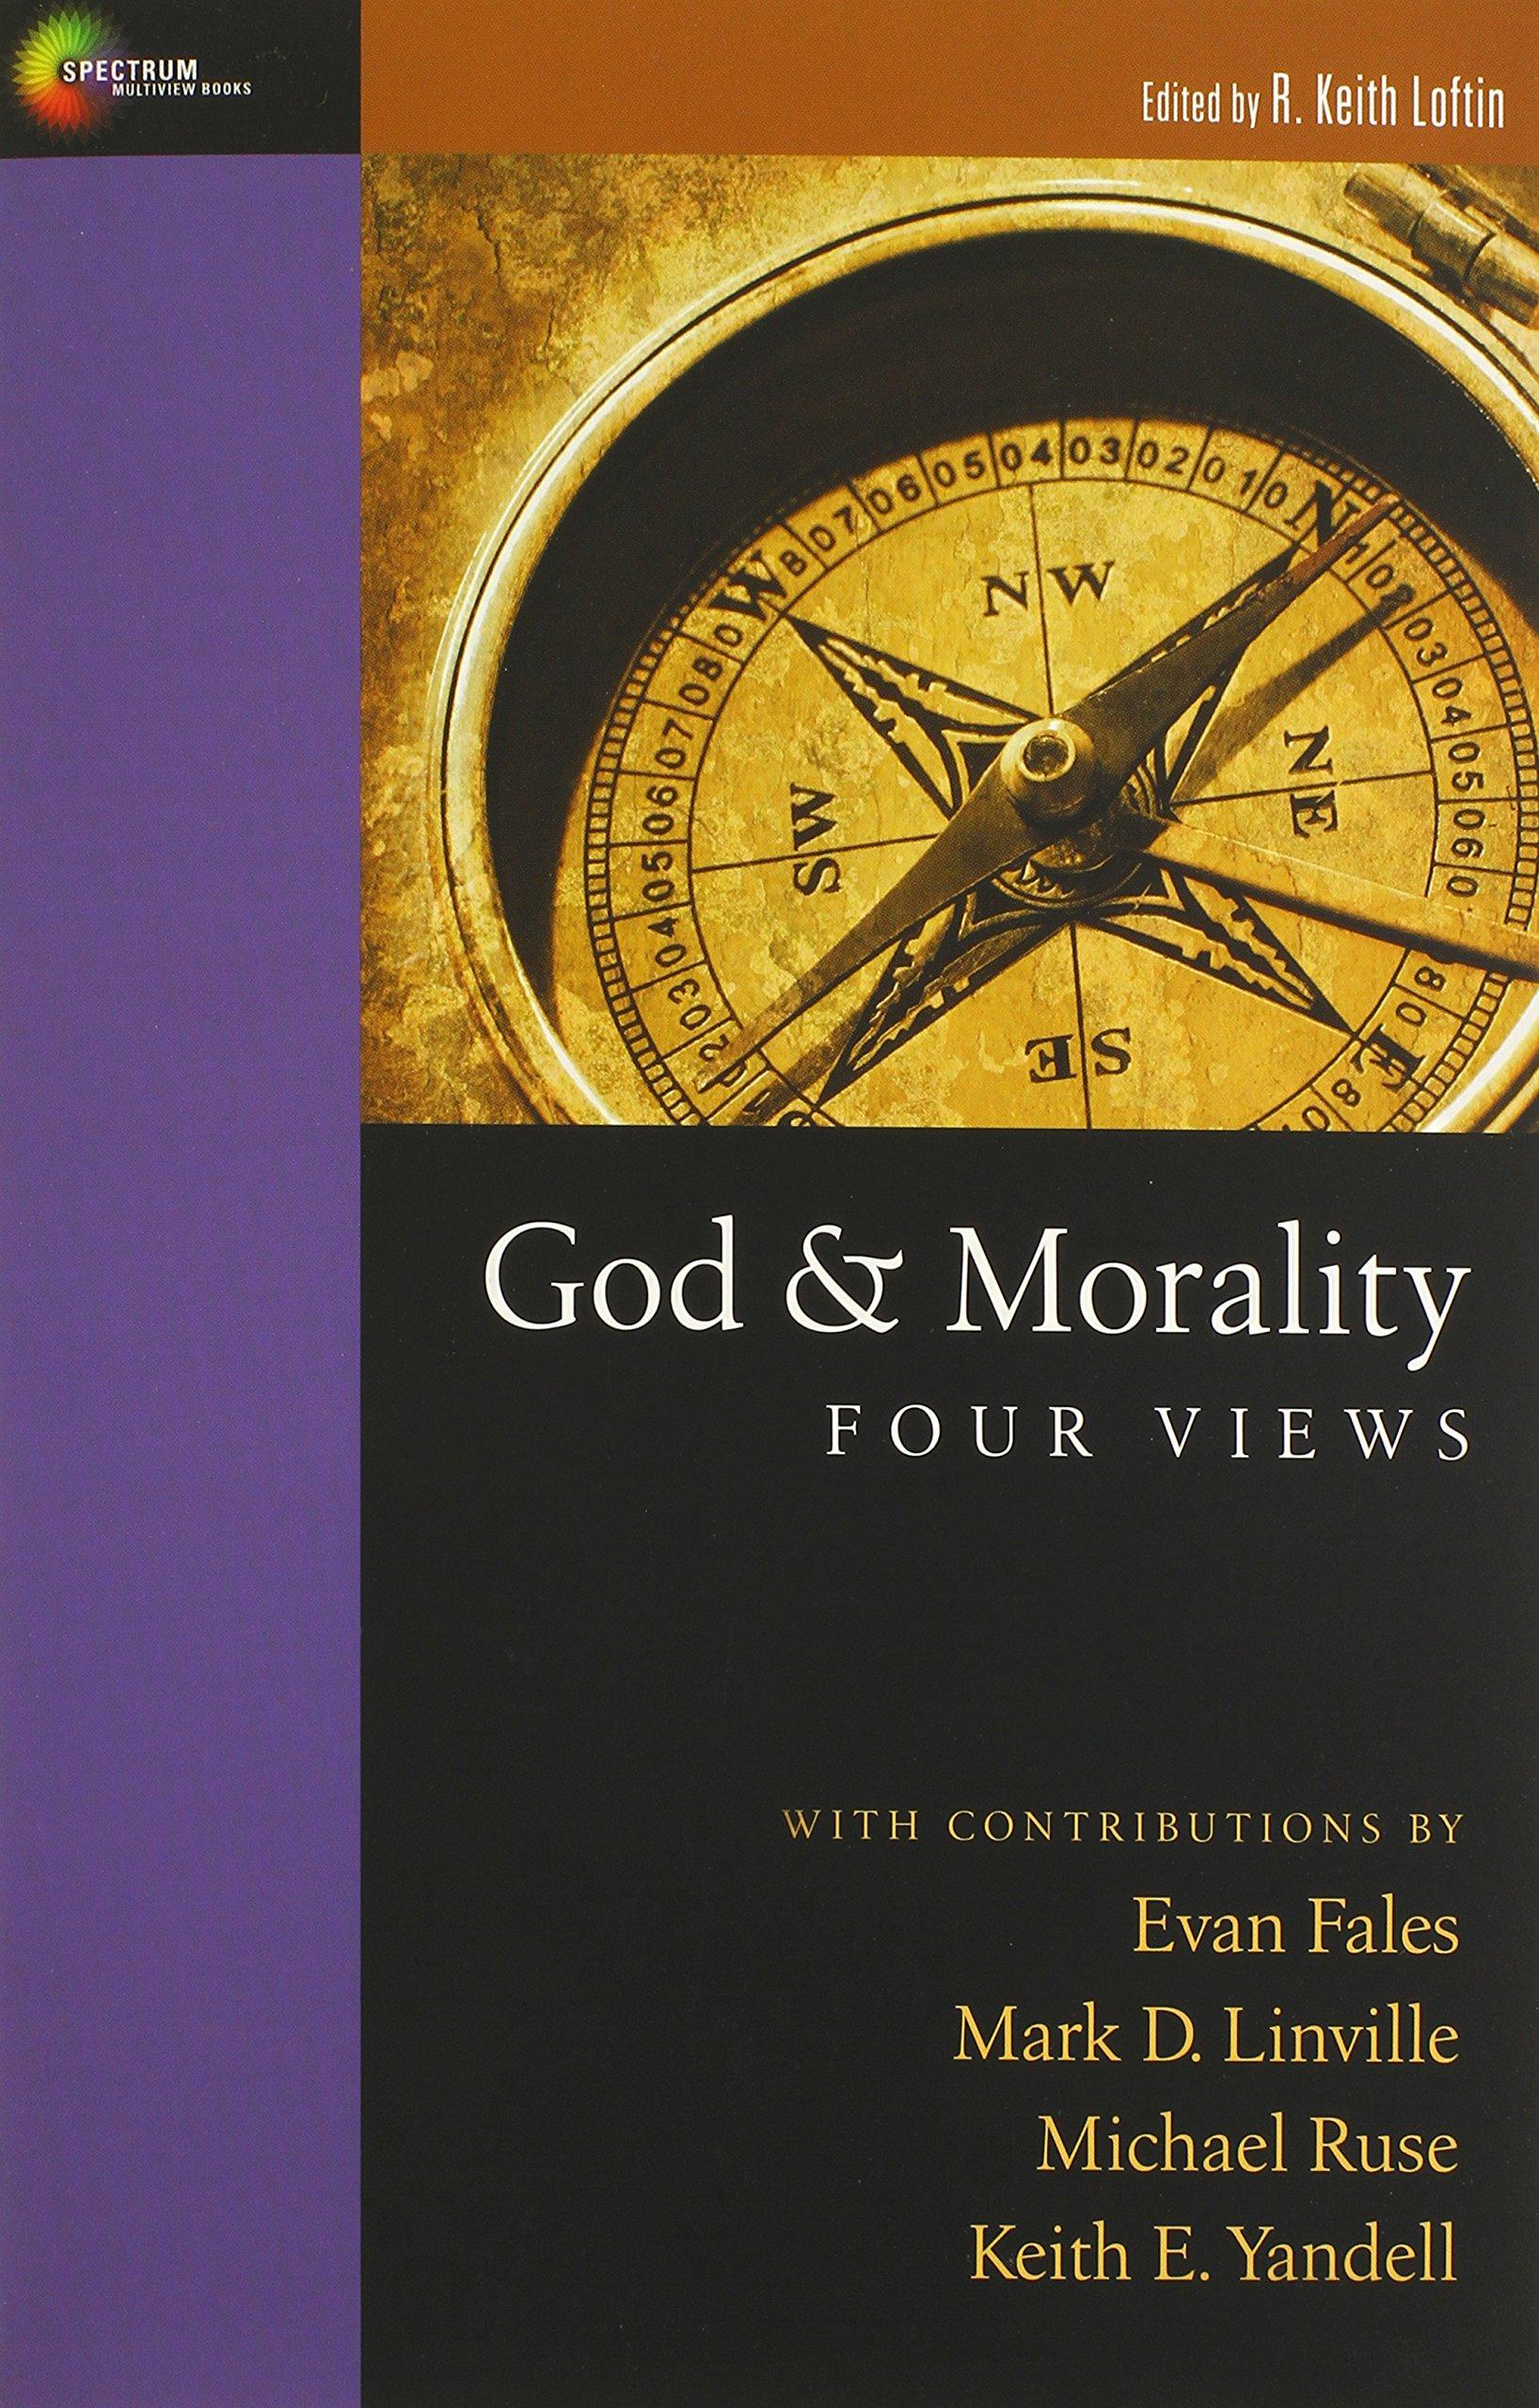 Download God & Morality: Four Views (Spectrum Multiview Books) pdf